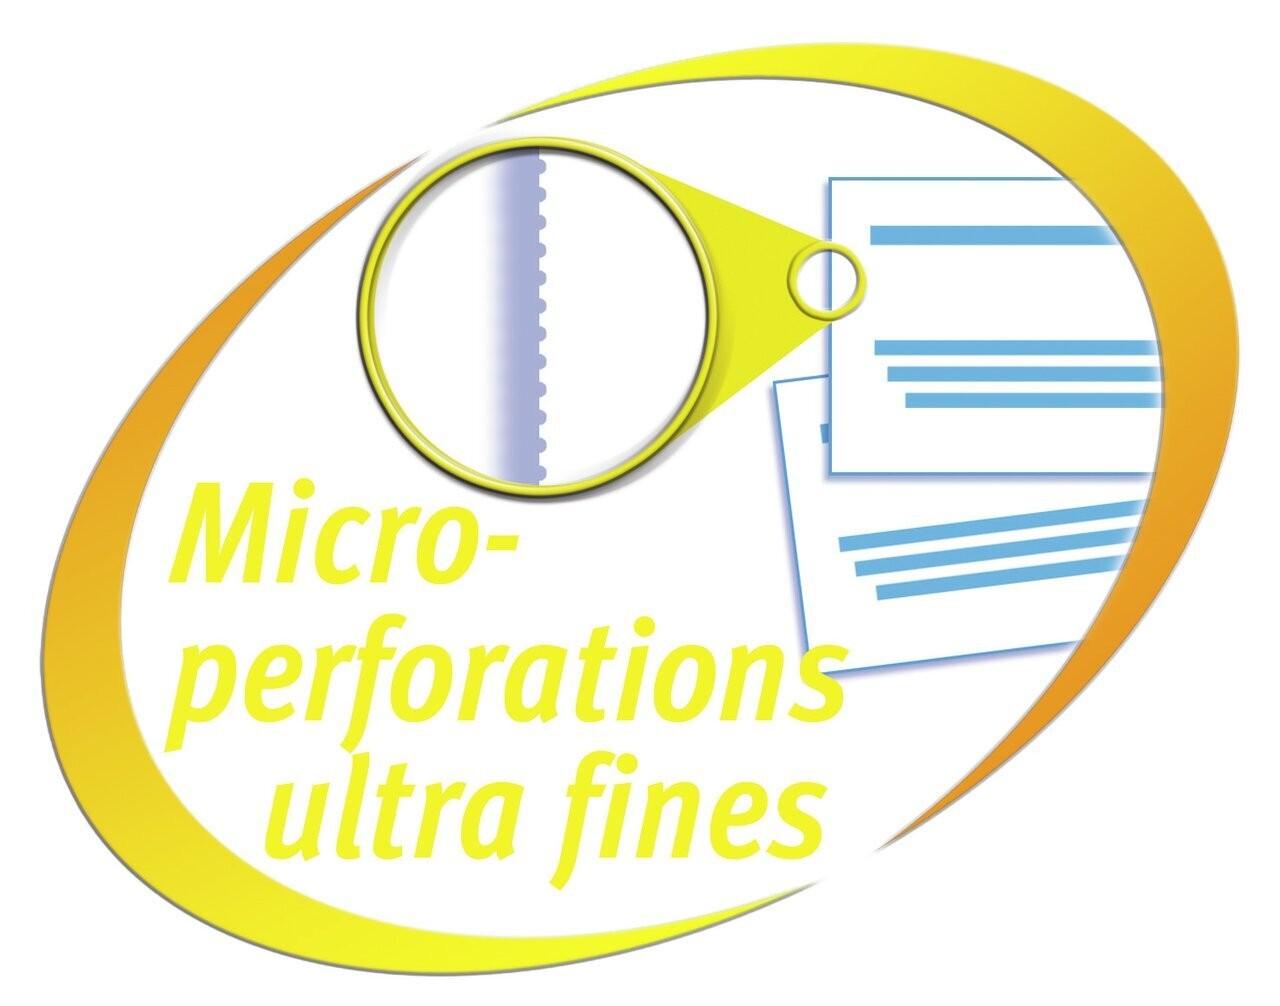 Microperforated FR Yellow 300 Violator